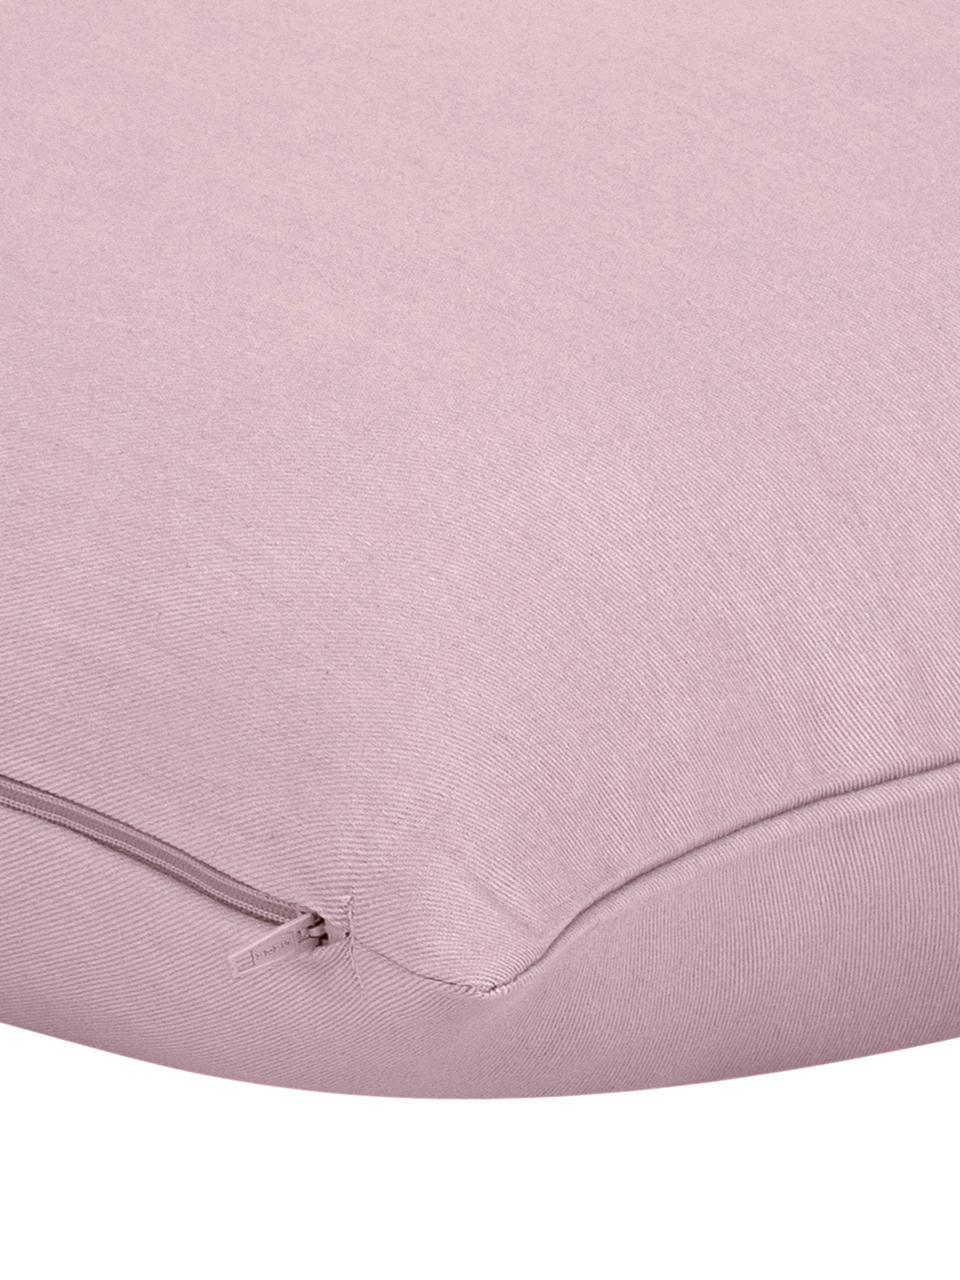 Federa arredo in cotone rosa Mads, 100% cotone, Rosa, Larg. 40 x Lung. 40 cm